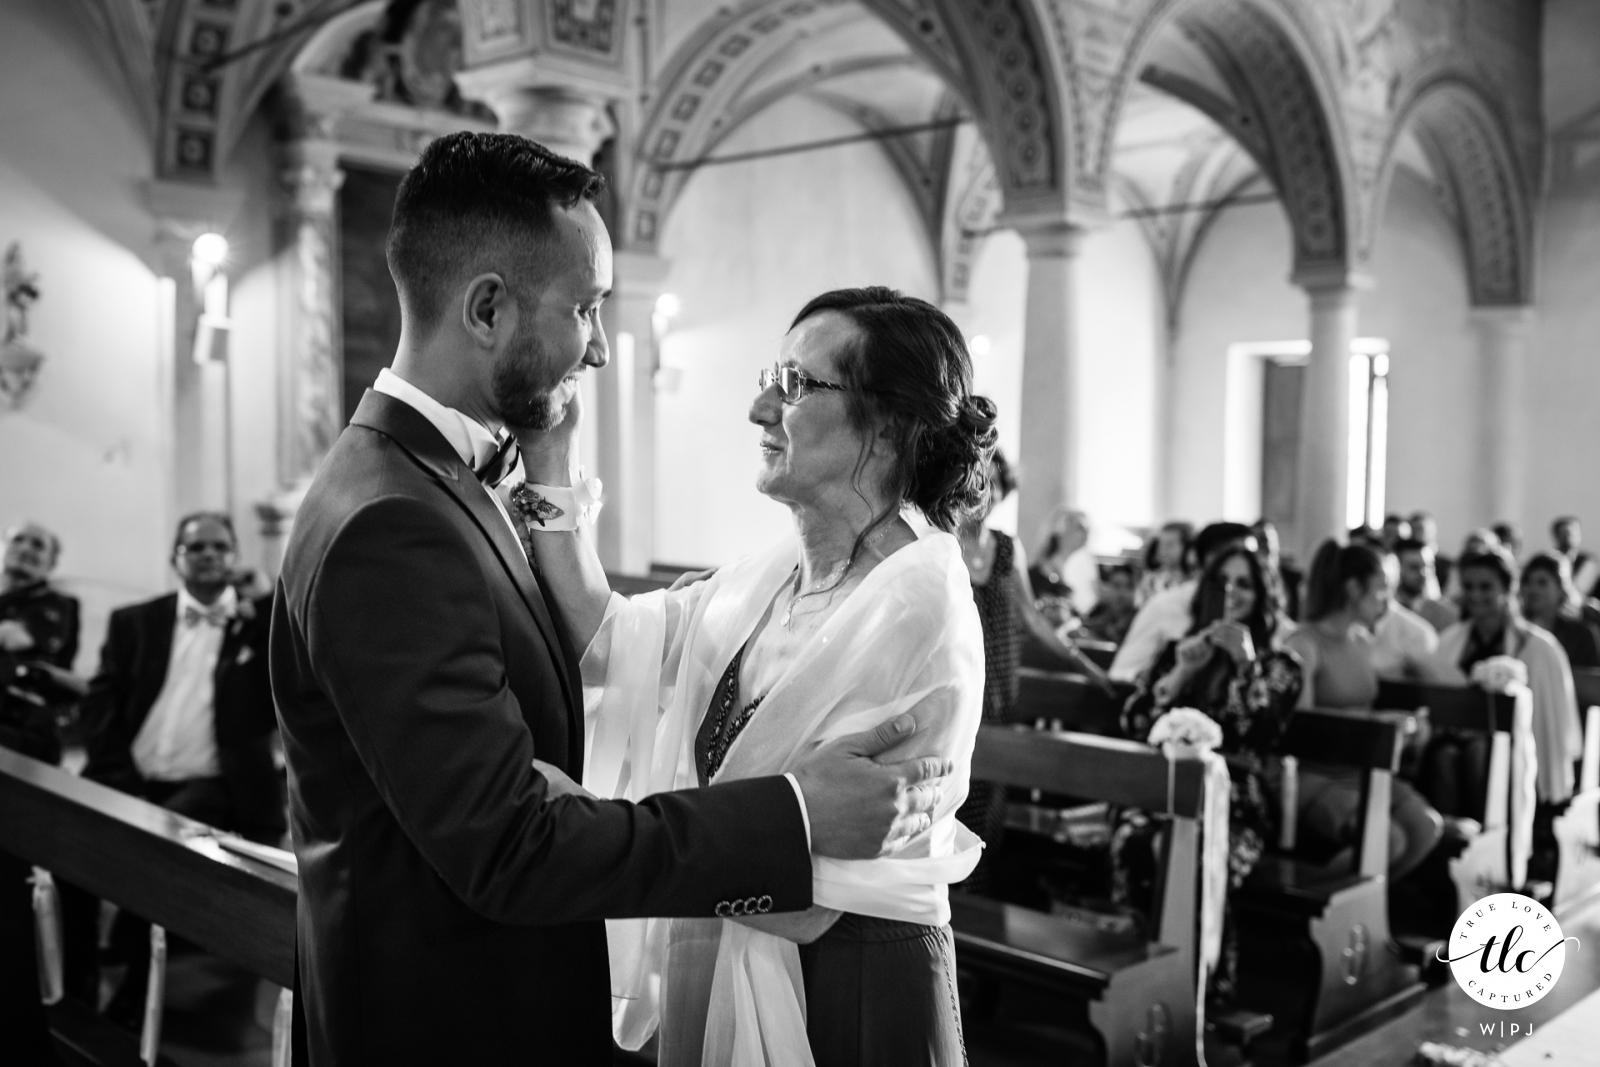 Chiesa Santa Maria Pregassona Lugano (CH) documentary wedding photo of the mother accompanying the groom to the altar